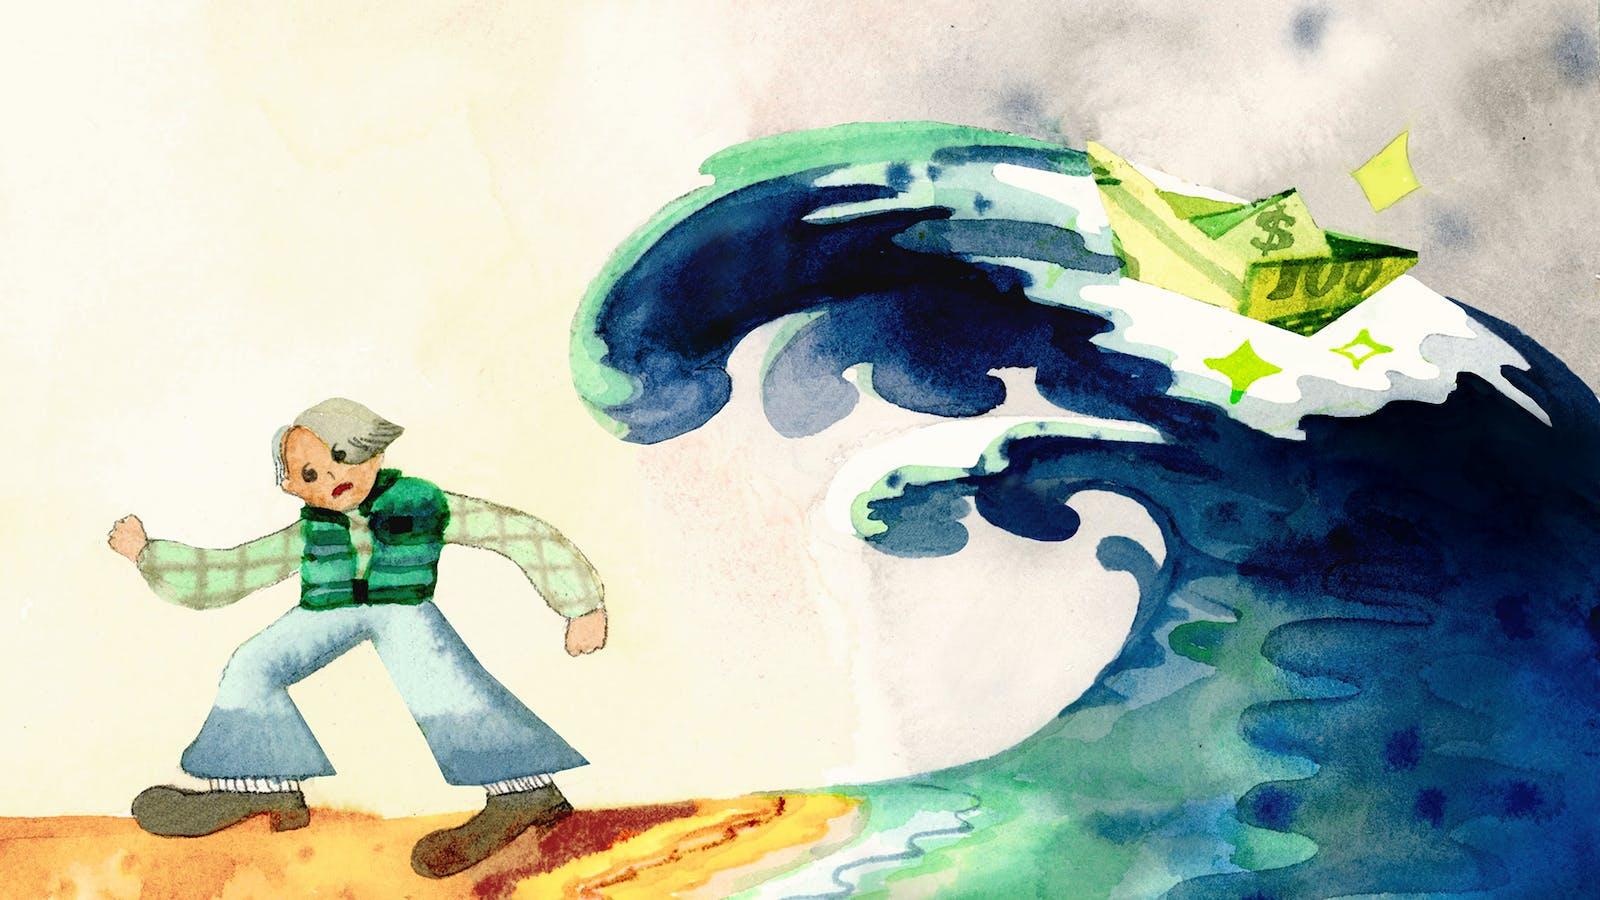 Illustration by Hae Jin Park.